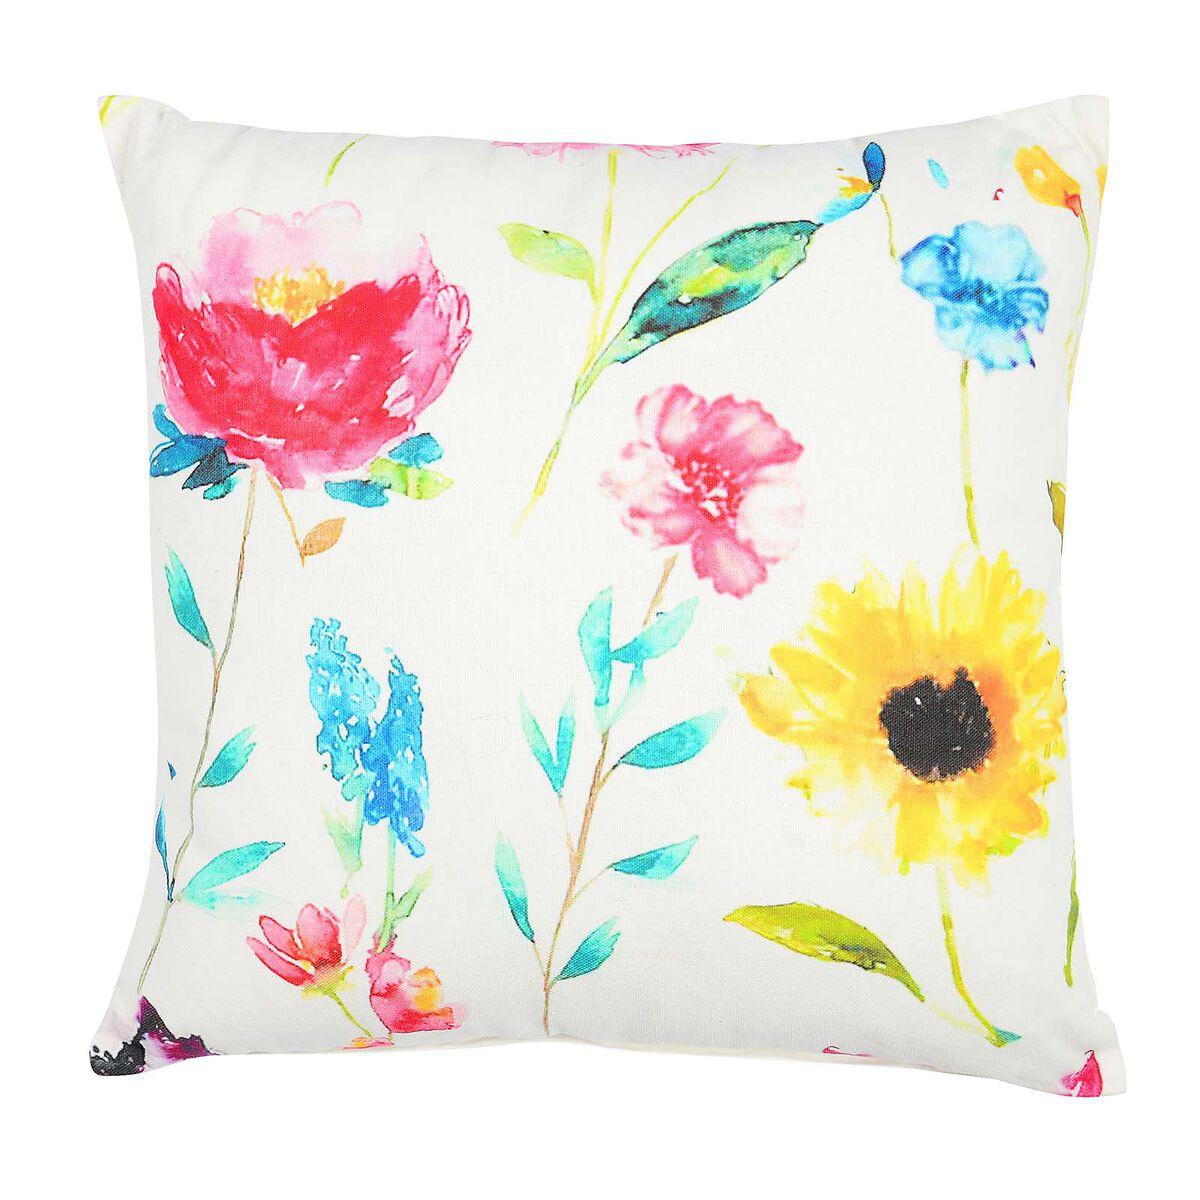 kissen flowers bunt ca b 45 x l 45 cm kissenbezug 100. Black Bedroom Furniture Sets. Home Design Ideas